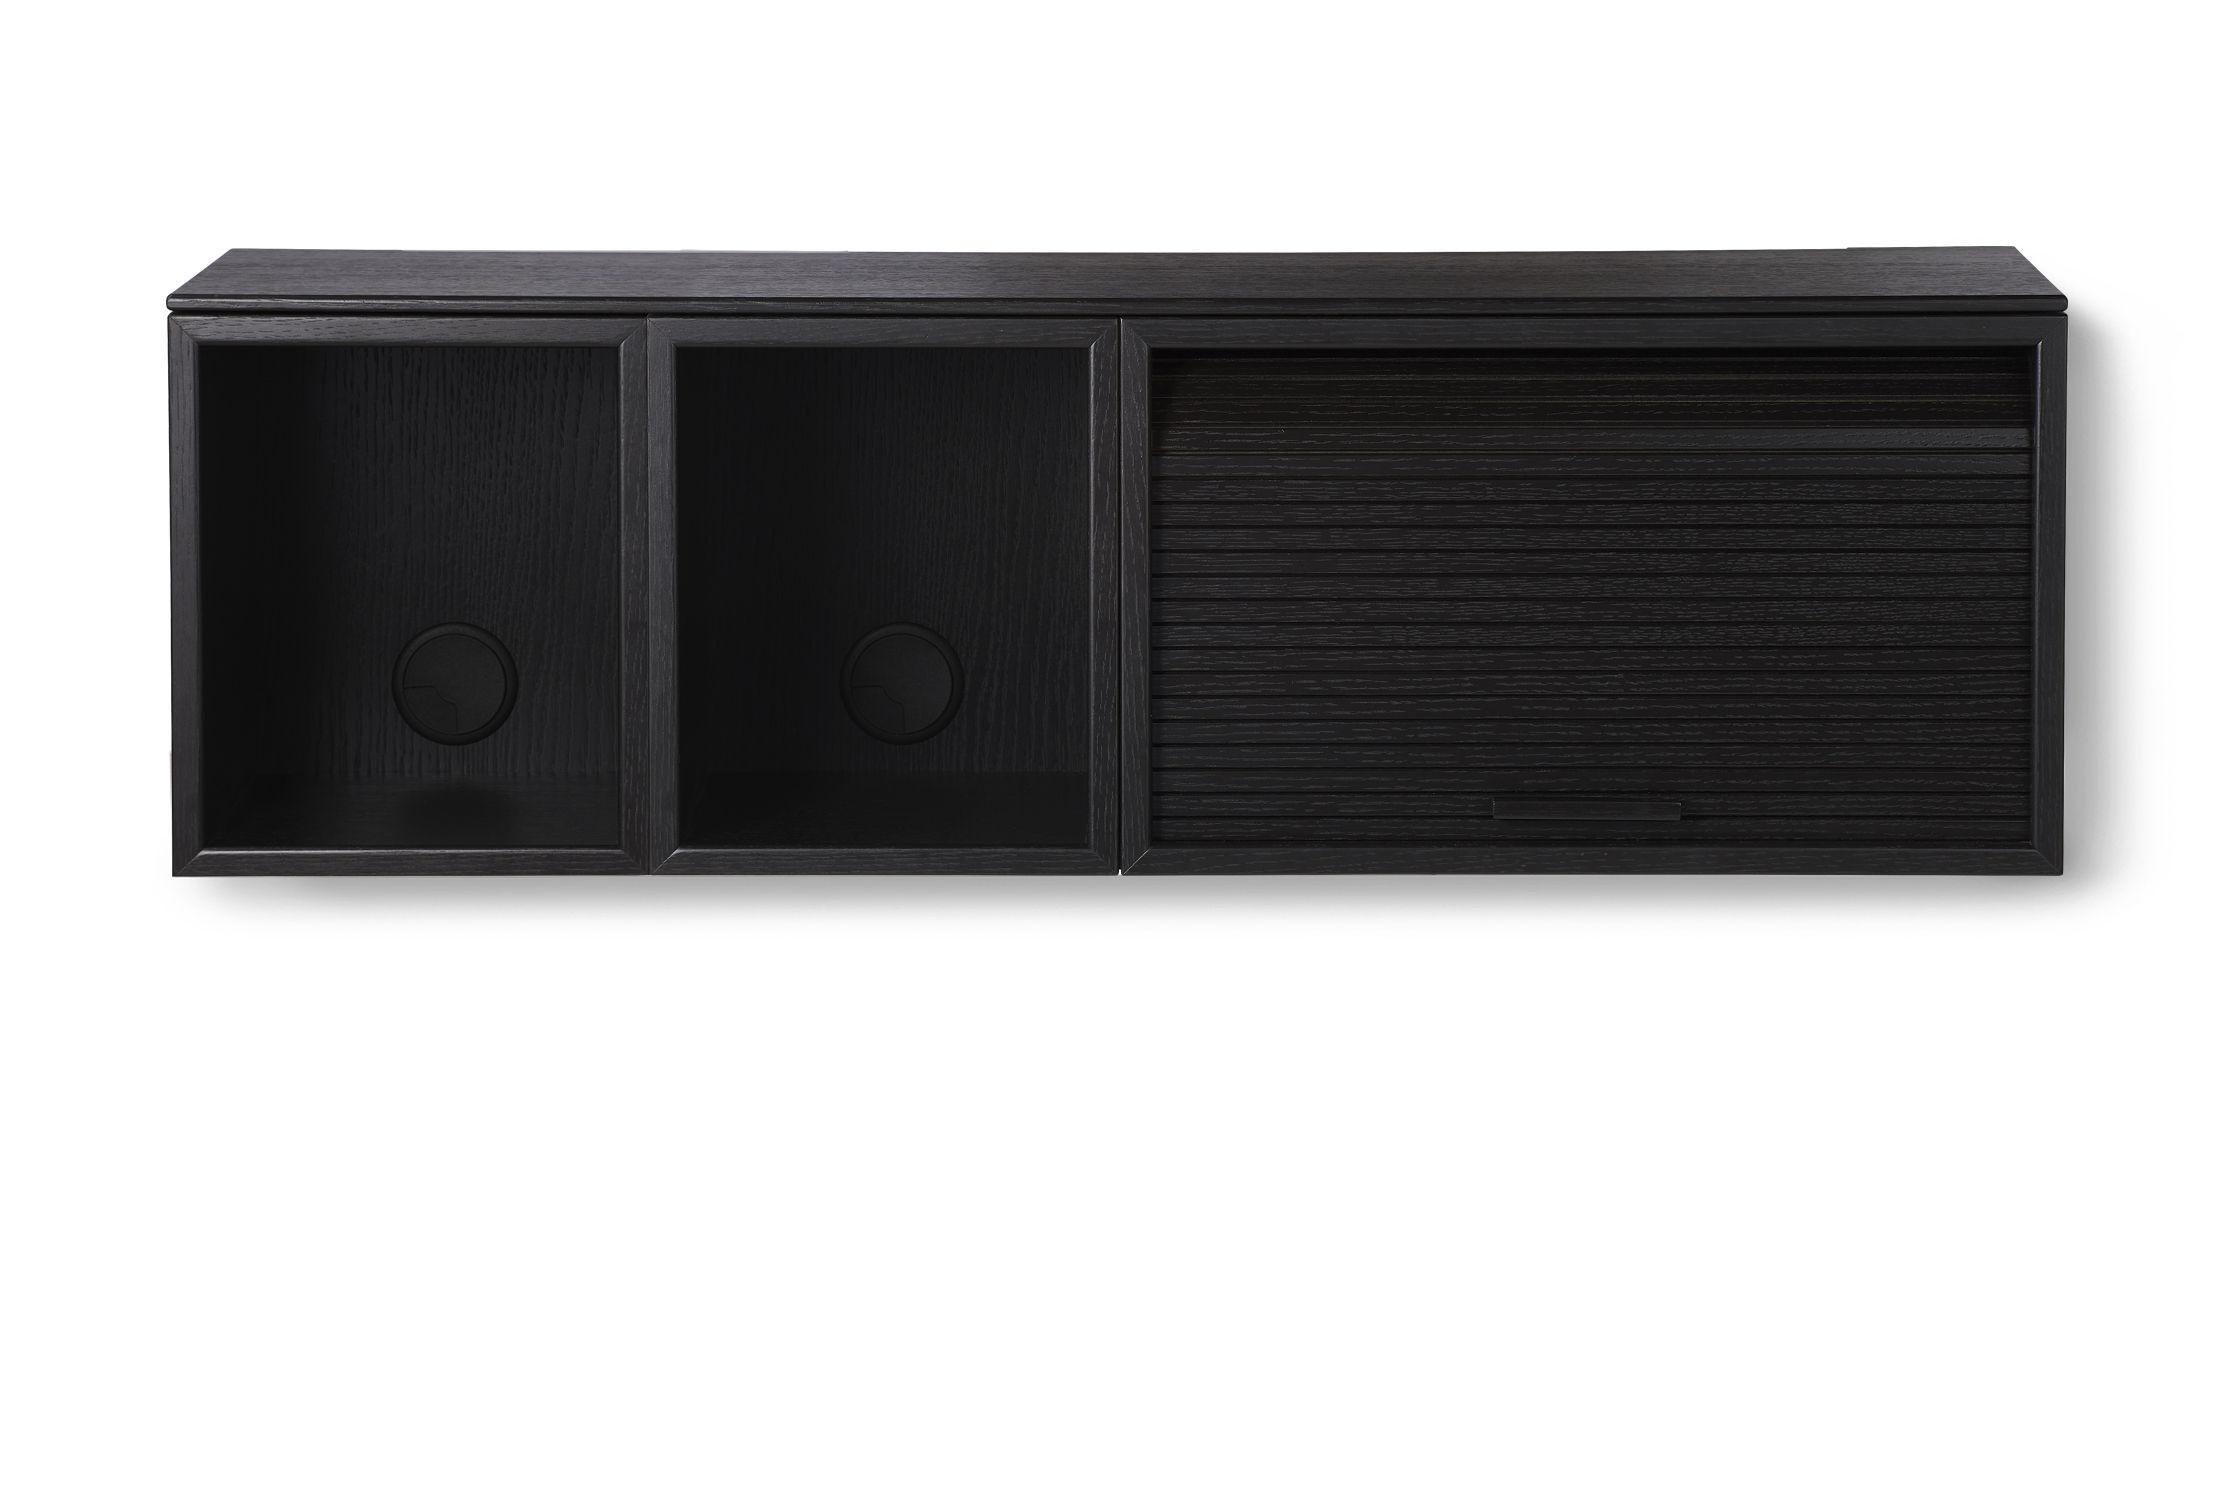 Furniture - Shelves & Storage Furniture - Hifive Slim Wall storage - / TV table - L 100 x H 30 cm by Northern  - Black - Plywood - painted oak